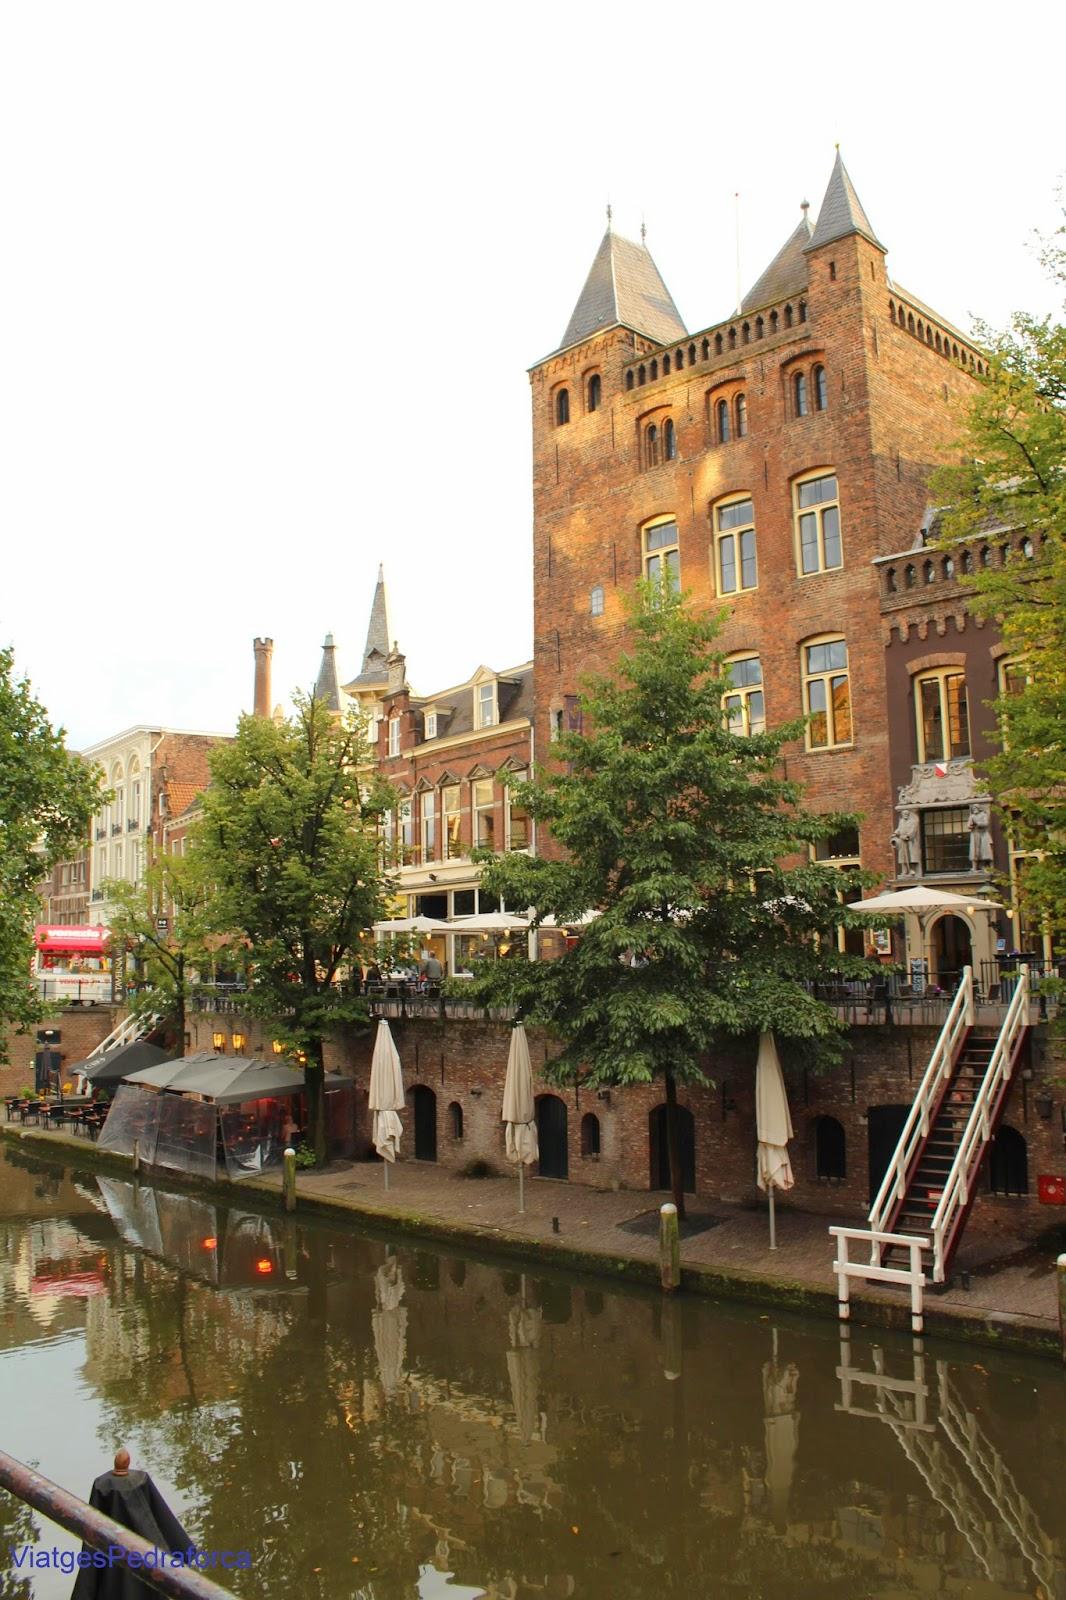 Canal d'Utrecht Països Baixos Holanda